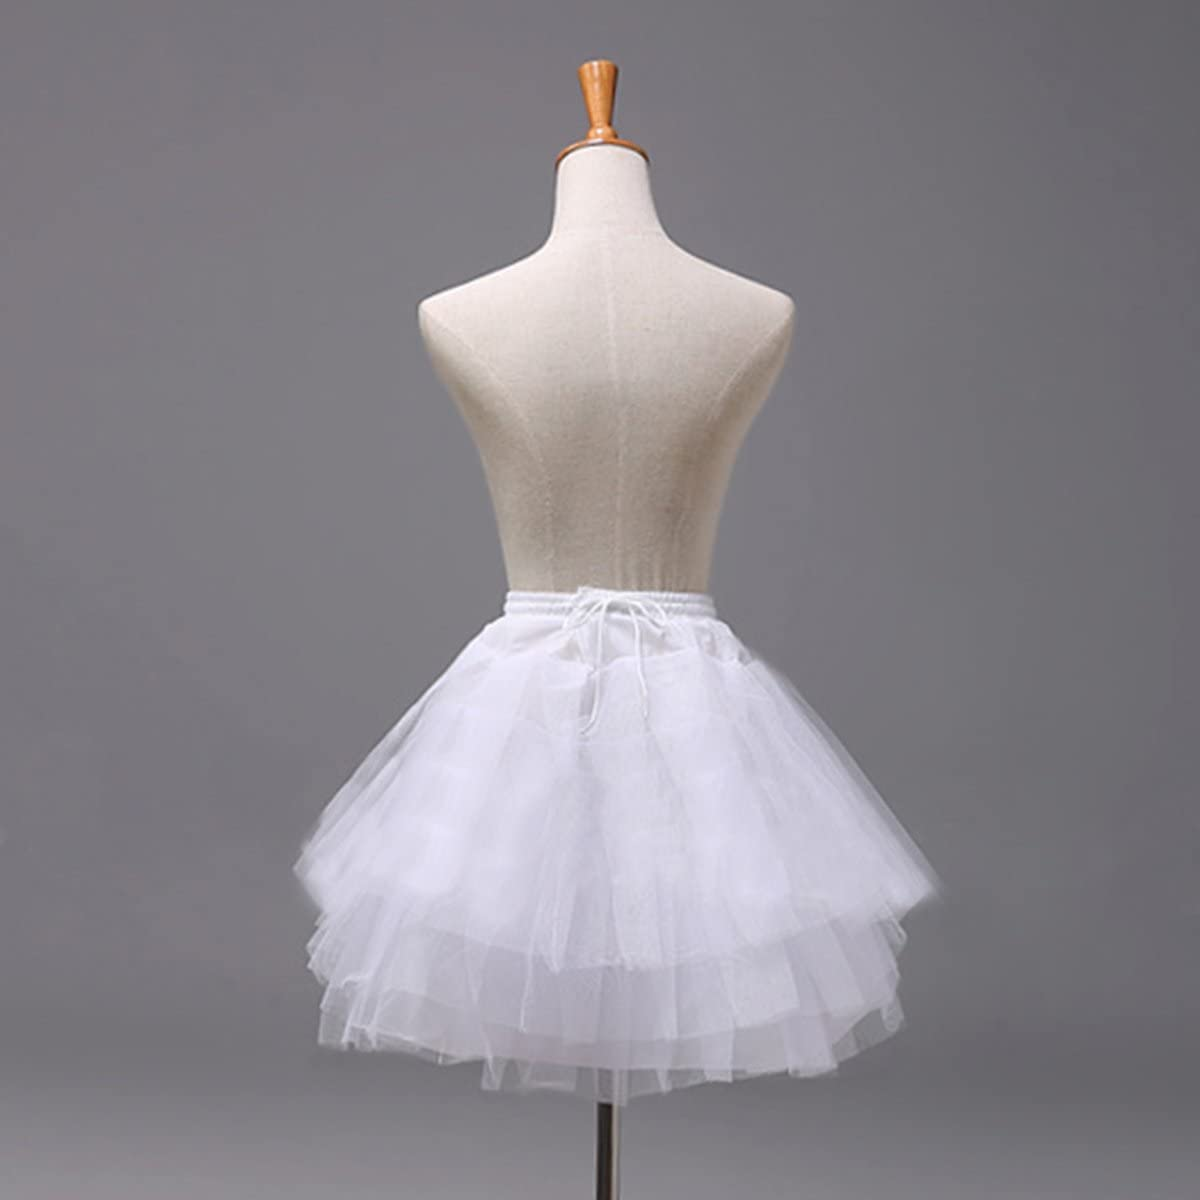 inhzoy Kids Princess Flower Girls Wedding Dress Petticoat 3 Layers Net Crinoline Underskirt Slip